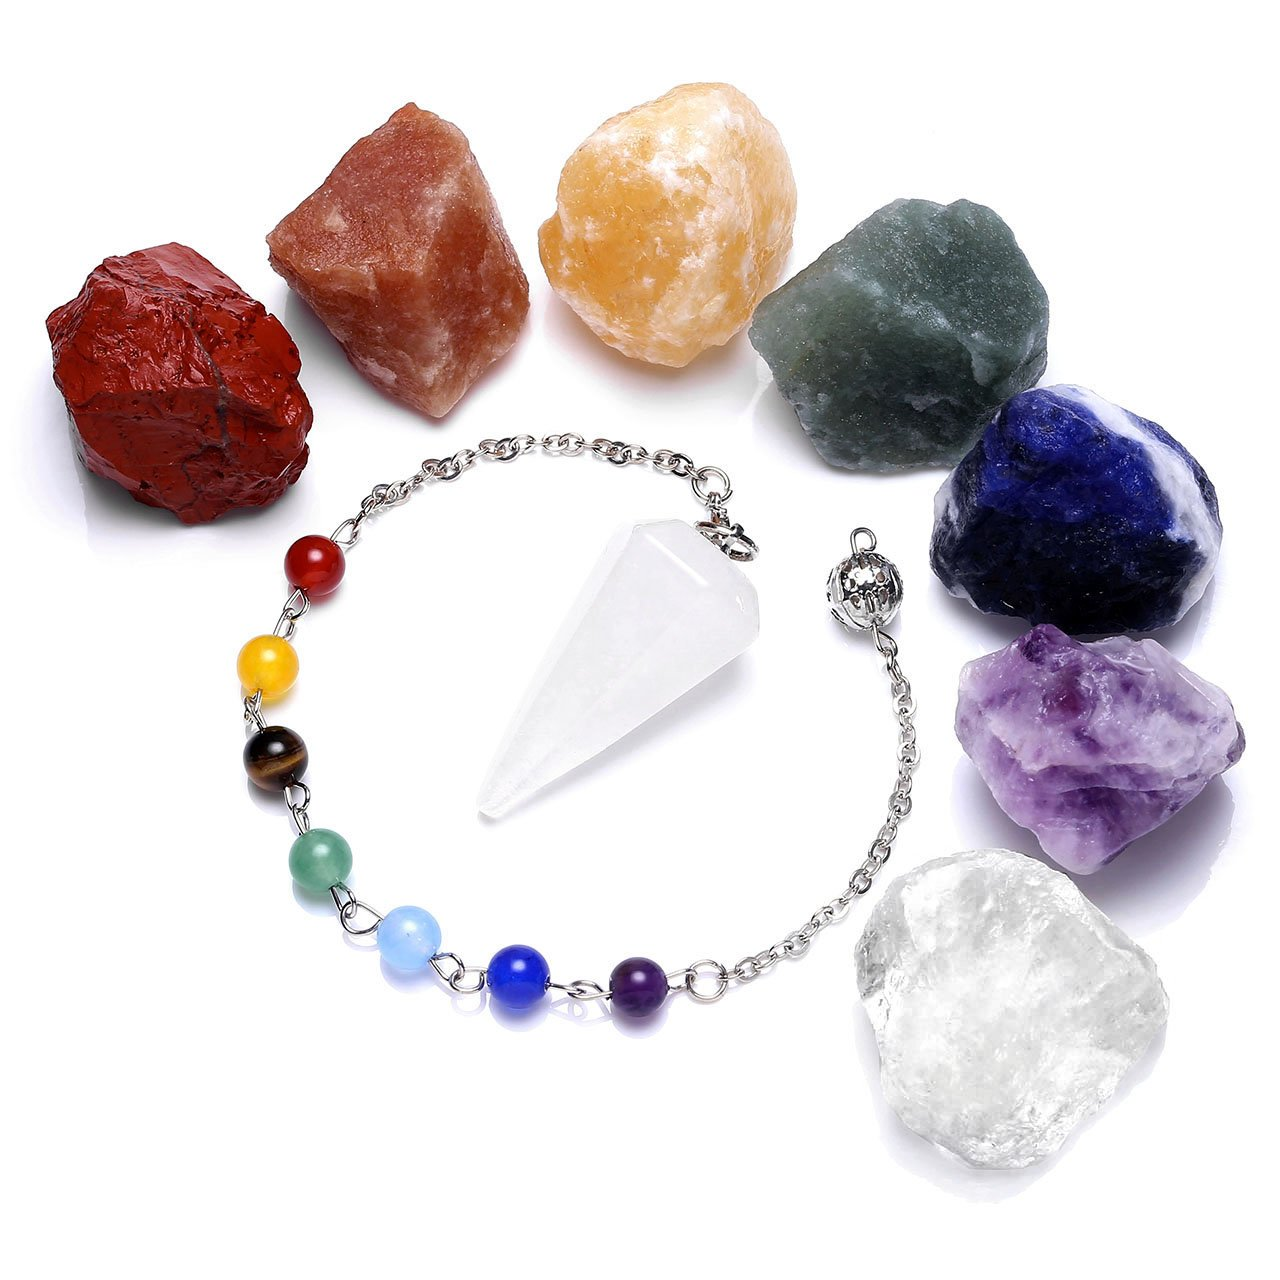 Top Plaza 7 Chakra Healing Raw Gemstones and Natural Clear Quartz Dowsing Pendulum Hexagonal Point Stones Pendant Reiki Balance Meditation Jewelry Sets